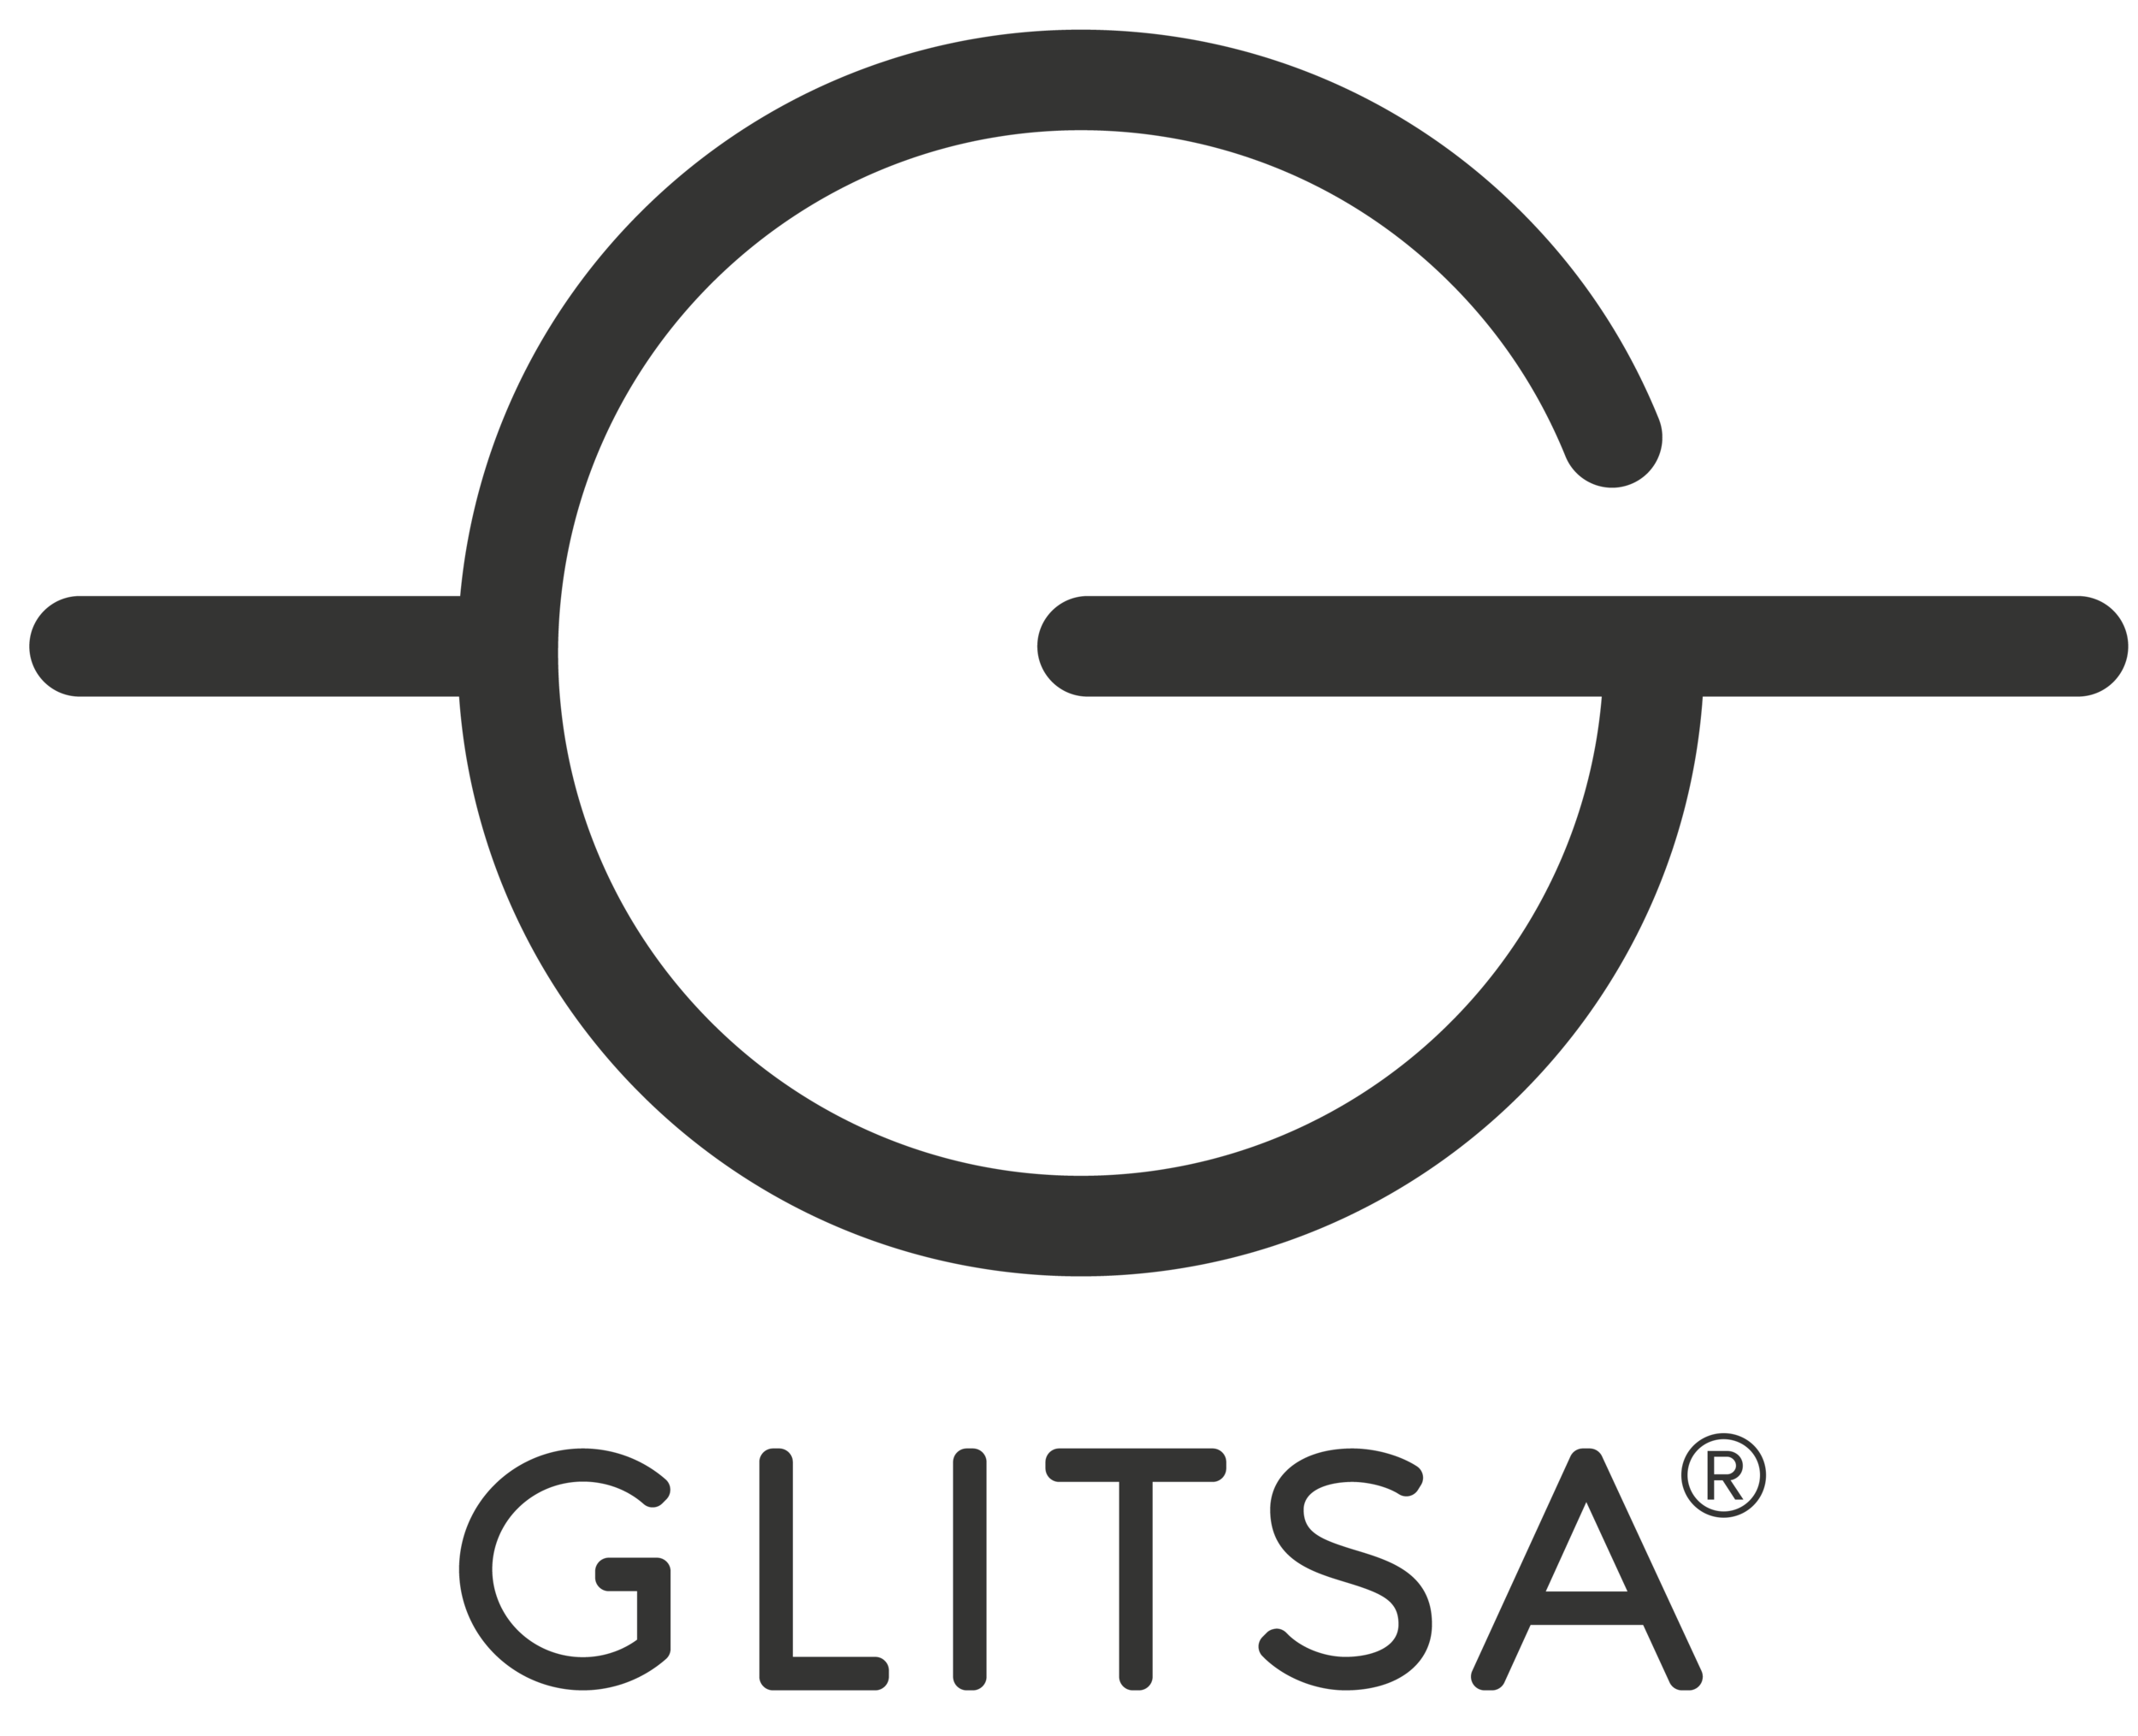 Glitsa-logo High Res.png